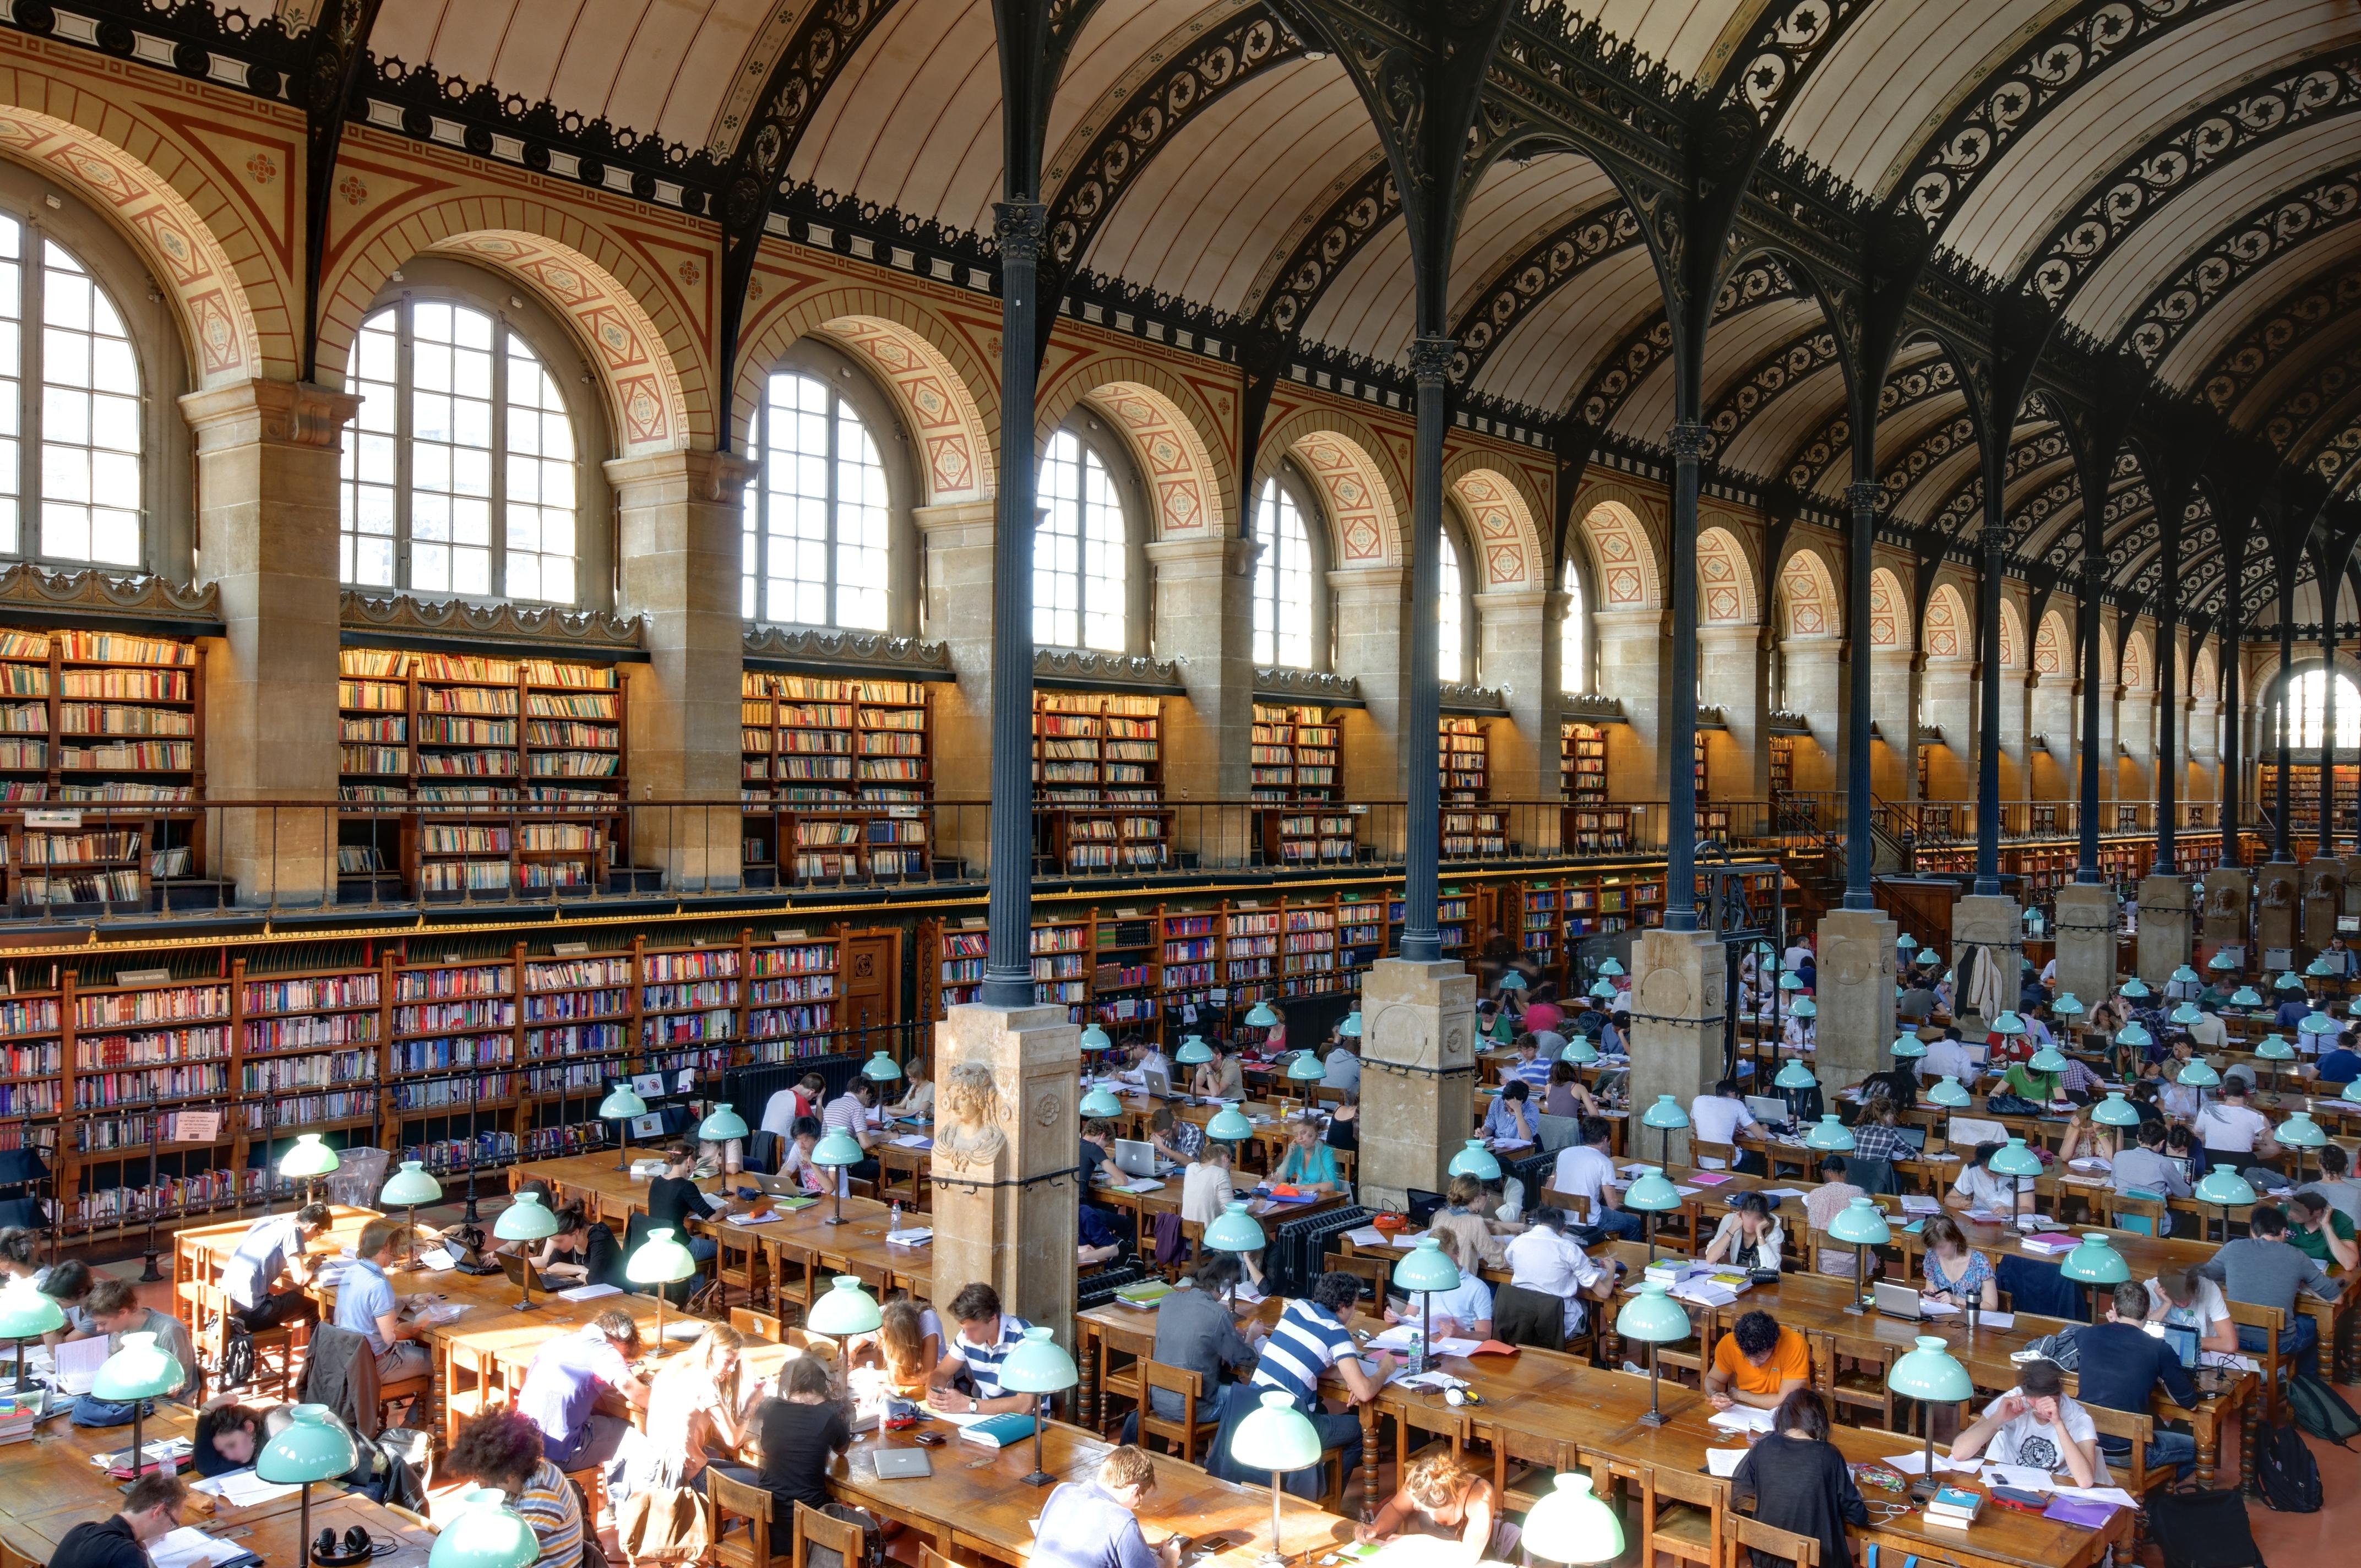 file salle de lecture bibliotheque sainte genevieve n11 jpg wikimedia commons